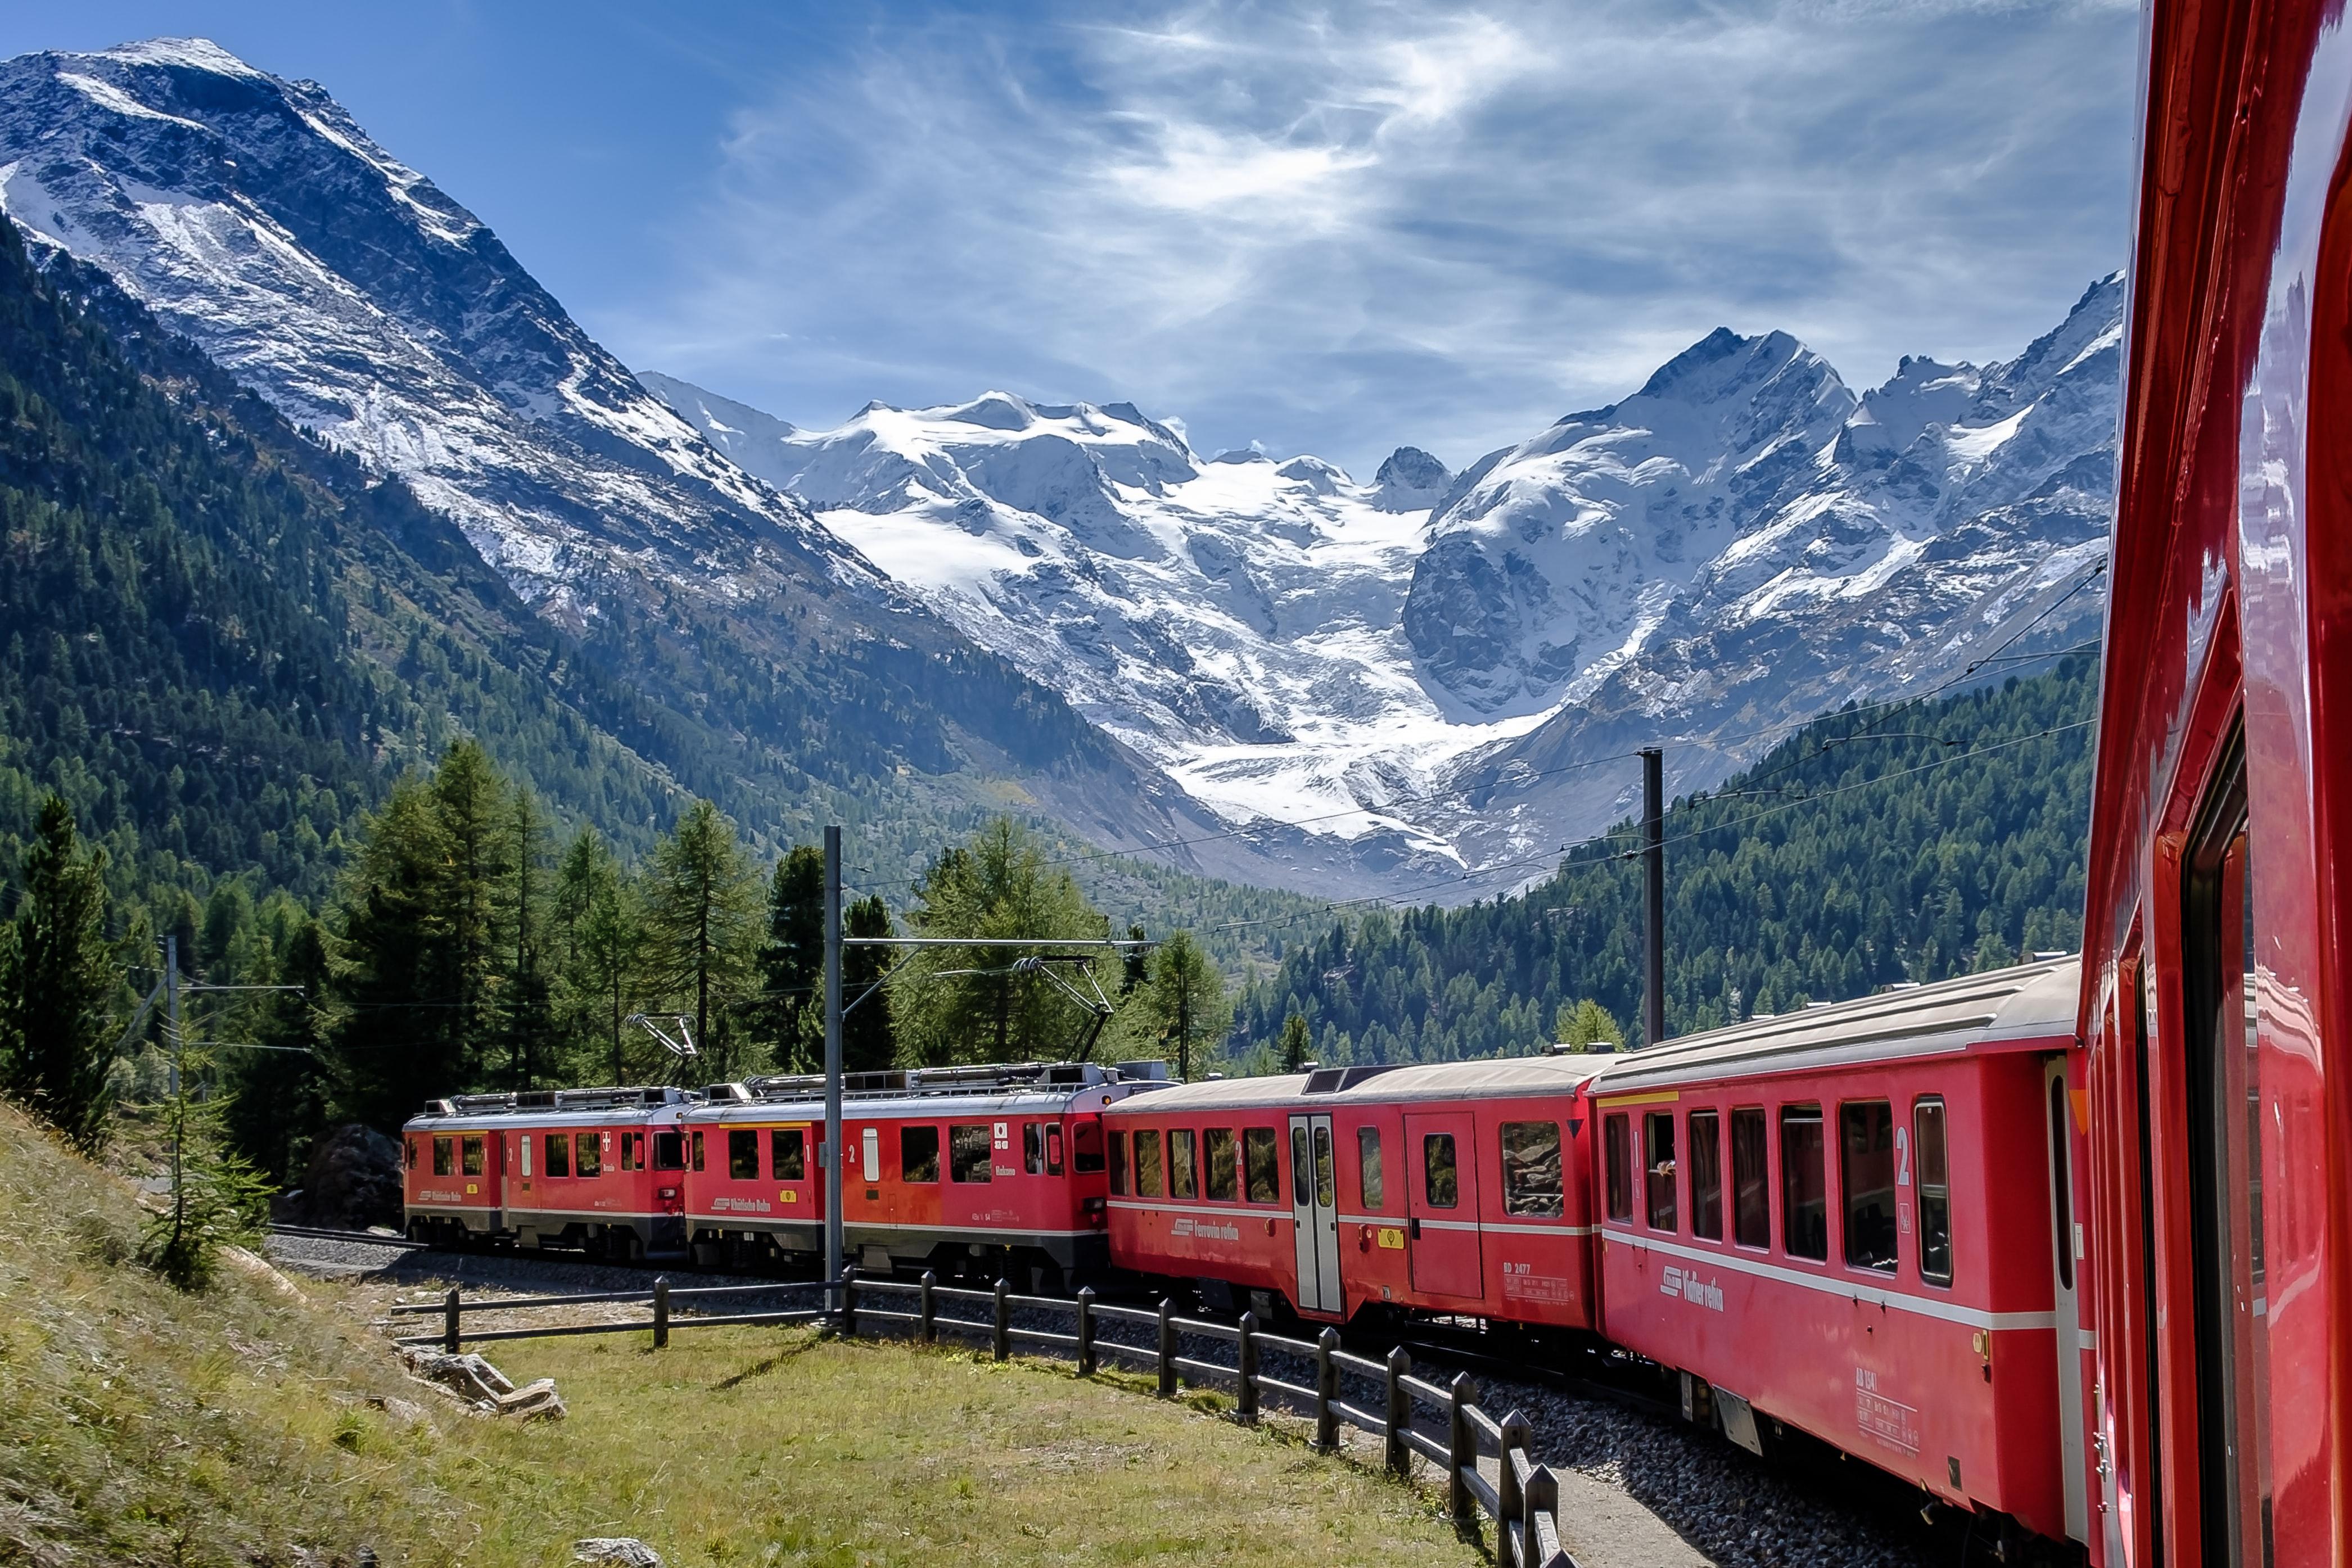 bernina express, most scenic train journeys to take in Switzerland